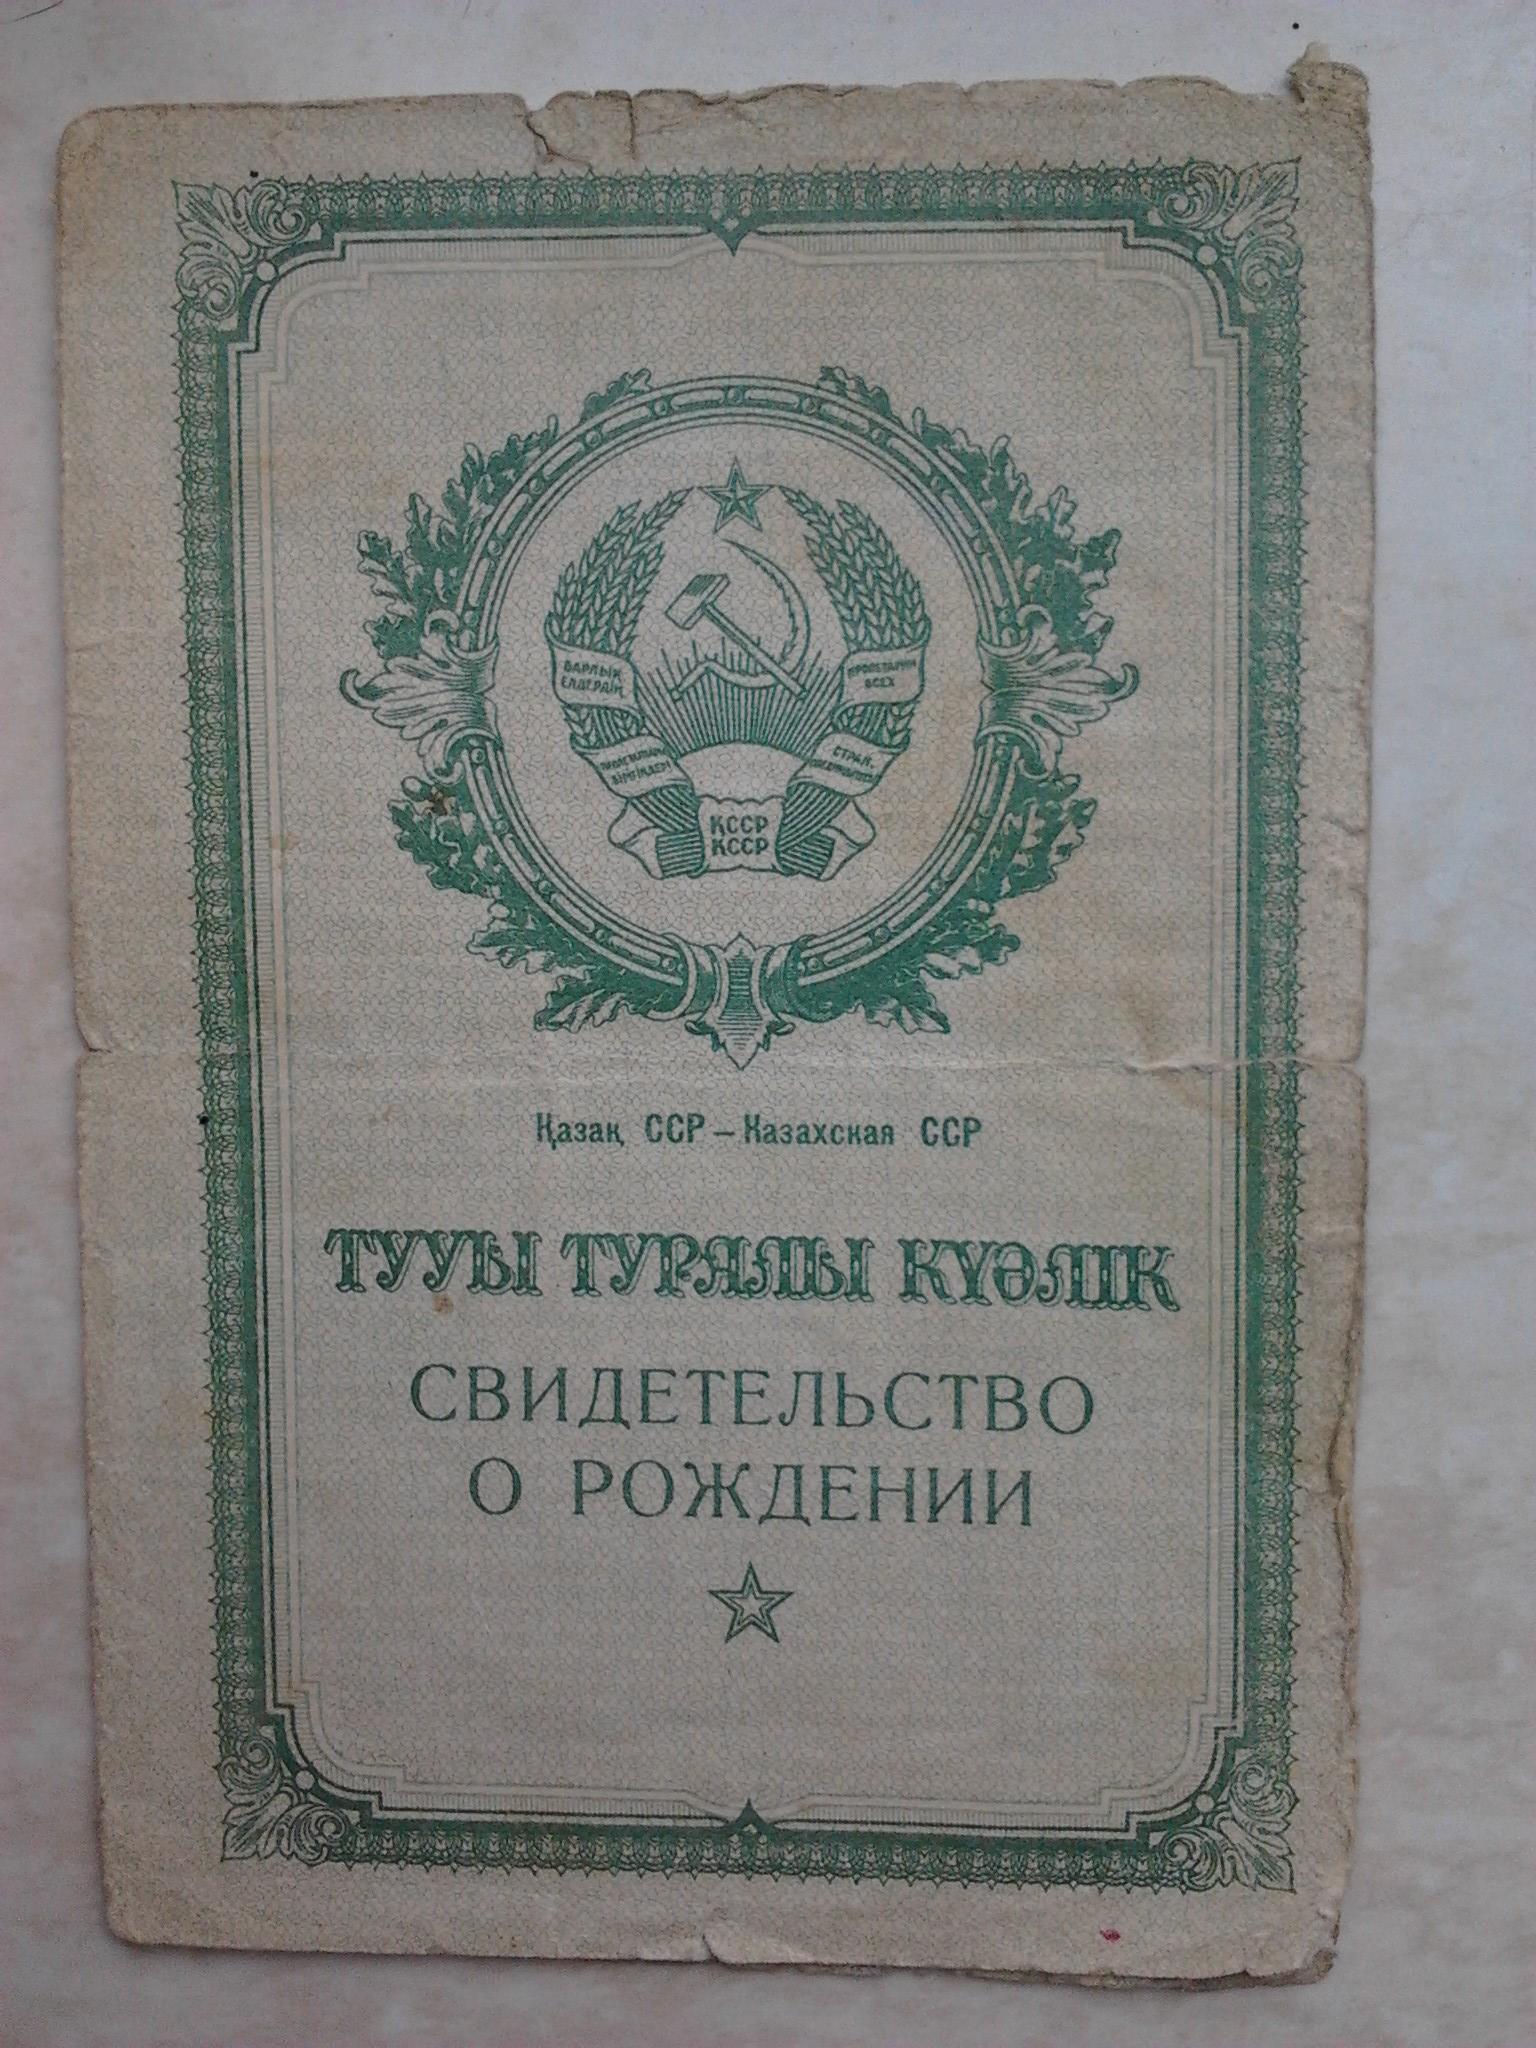 Filekazakh soviet birth certificate 1955g wikimedia commons filekazakh soviet birth certificate 1955g xflitez Gallery